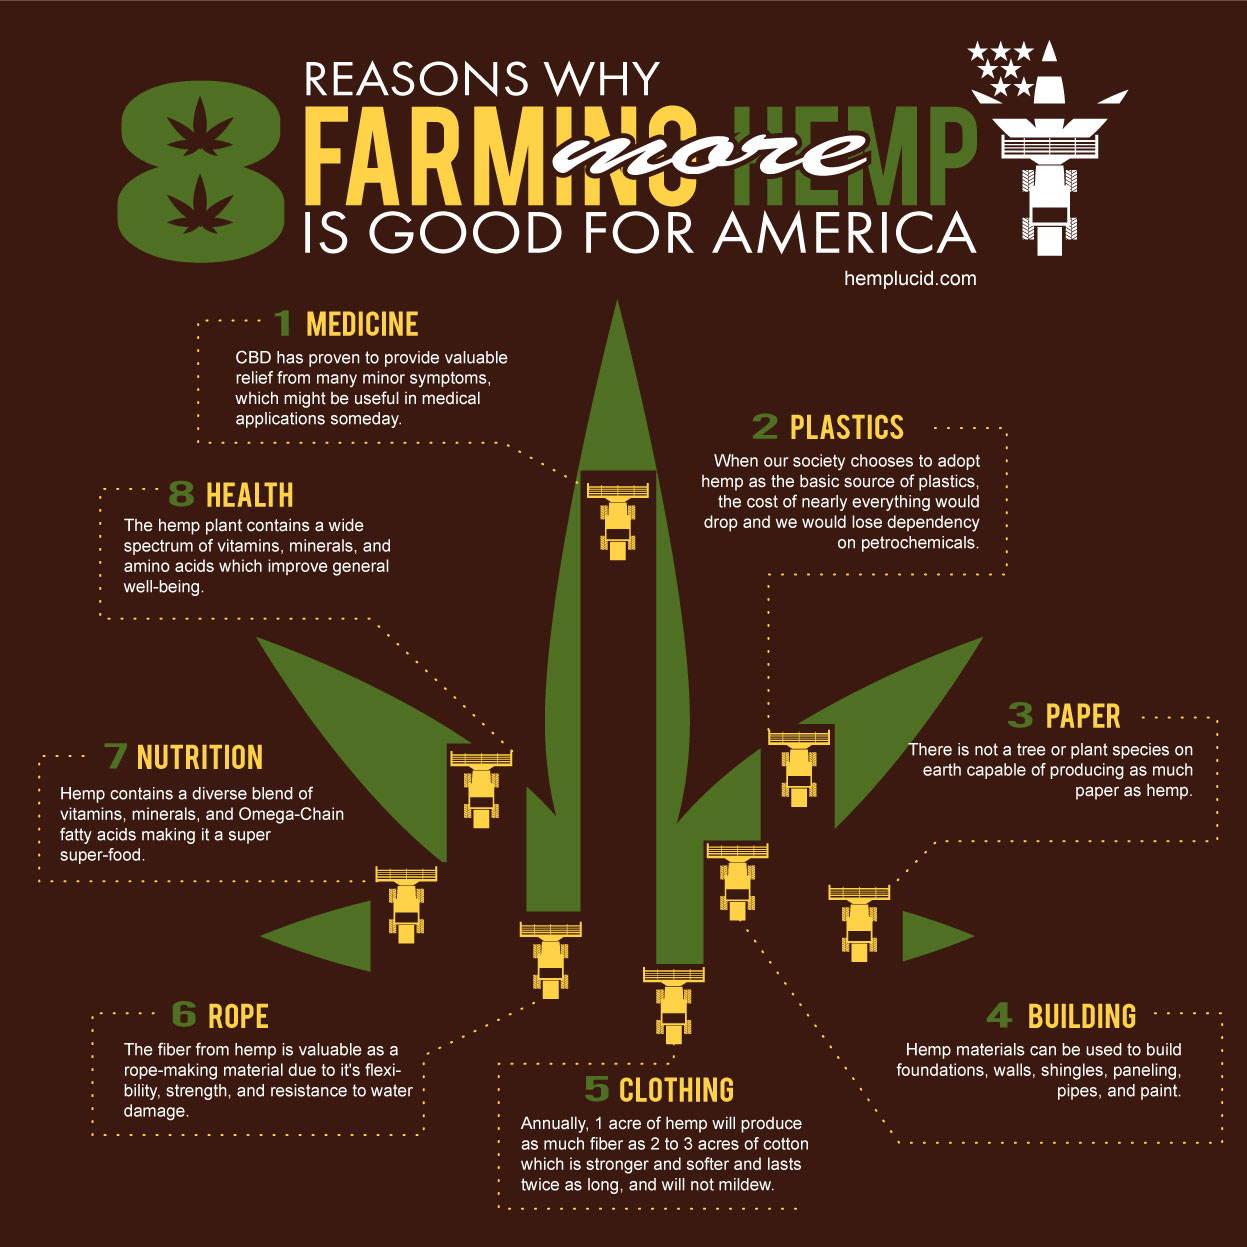 farm-more-hemp